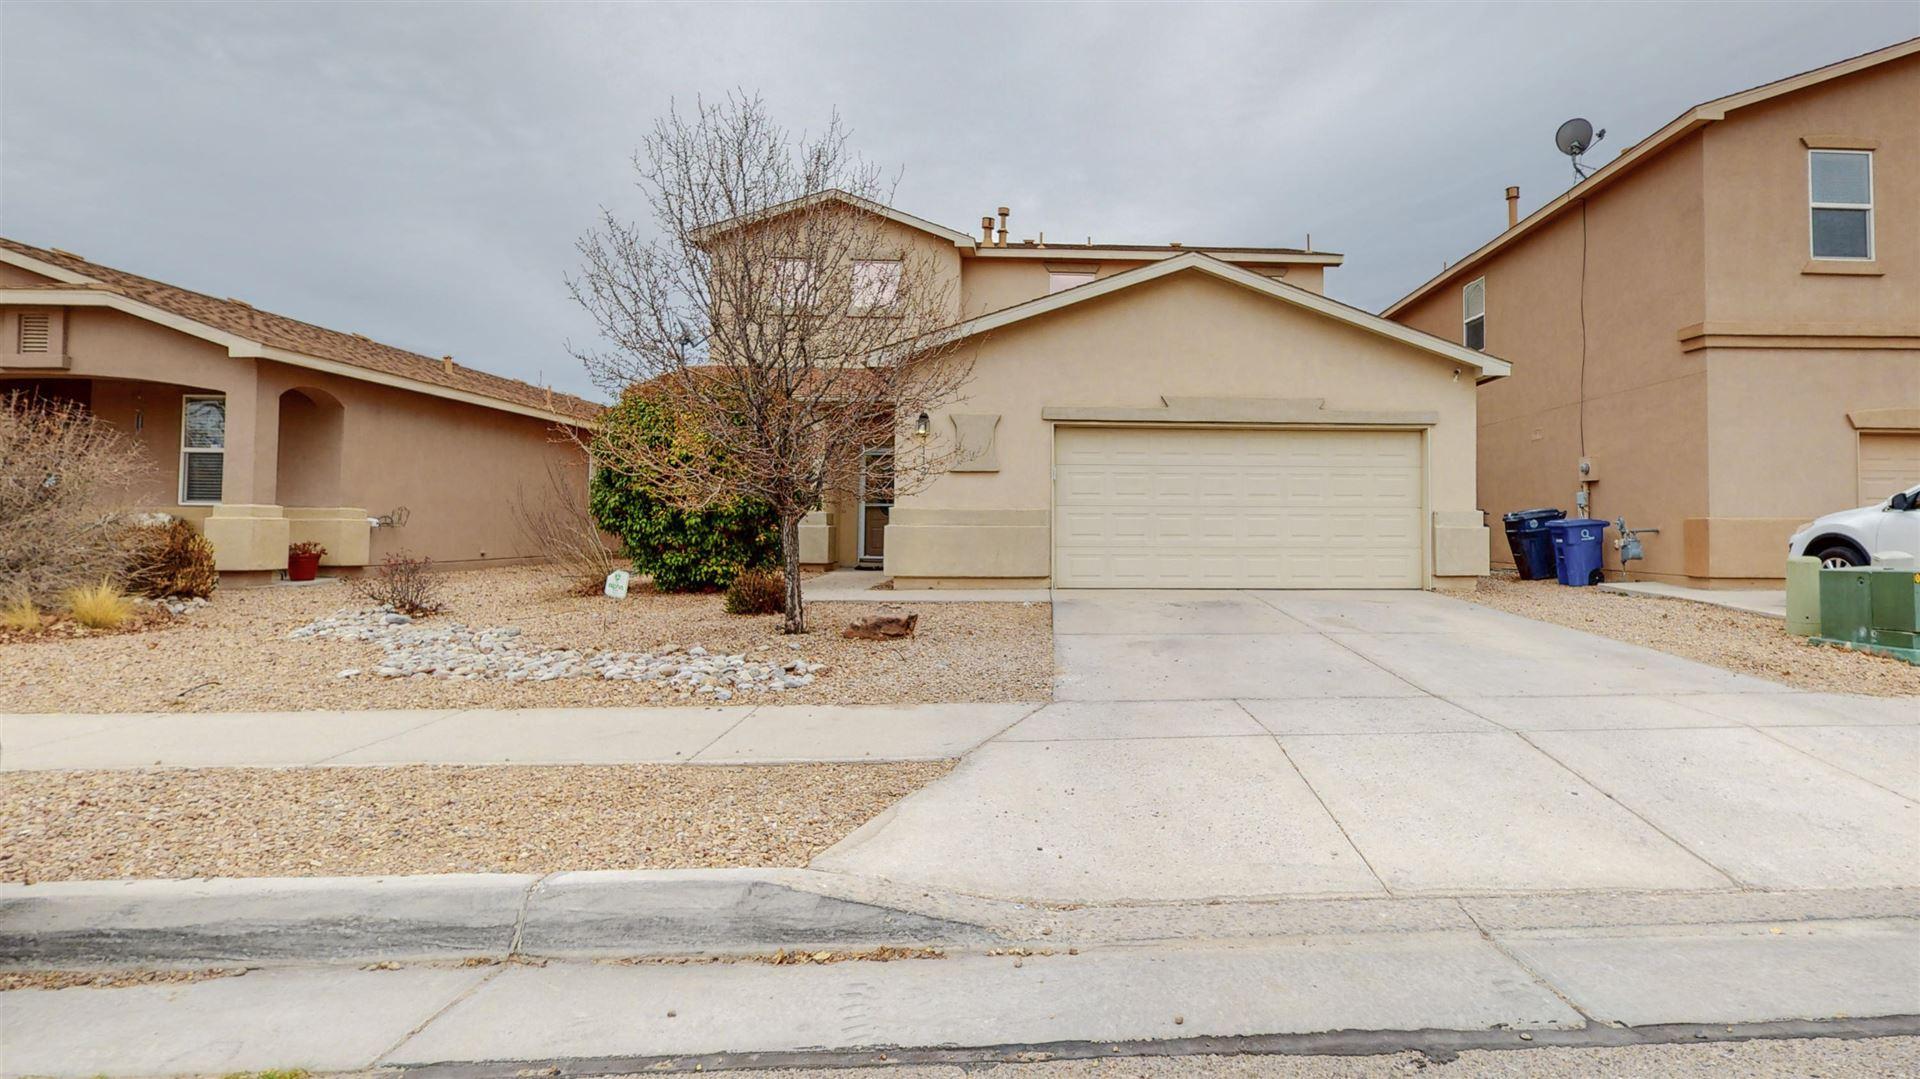 Photo of 3112 W MEADOW Drive SW, Albuquerque, NM 87121 (MLS # 984147)